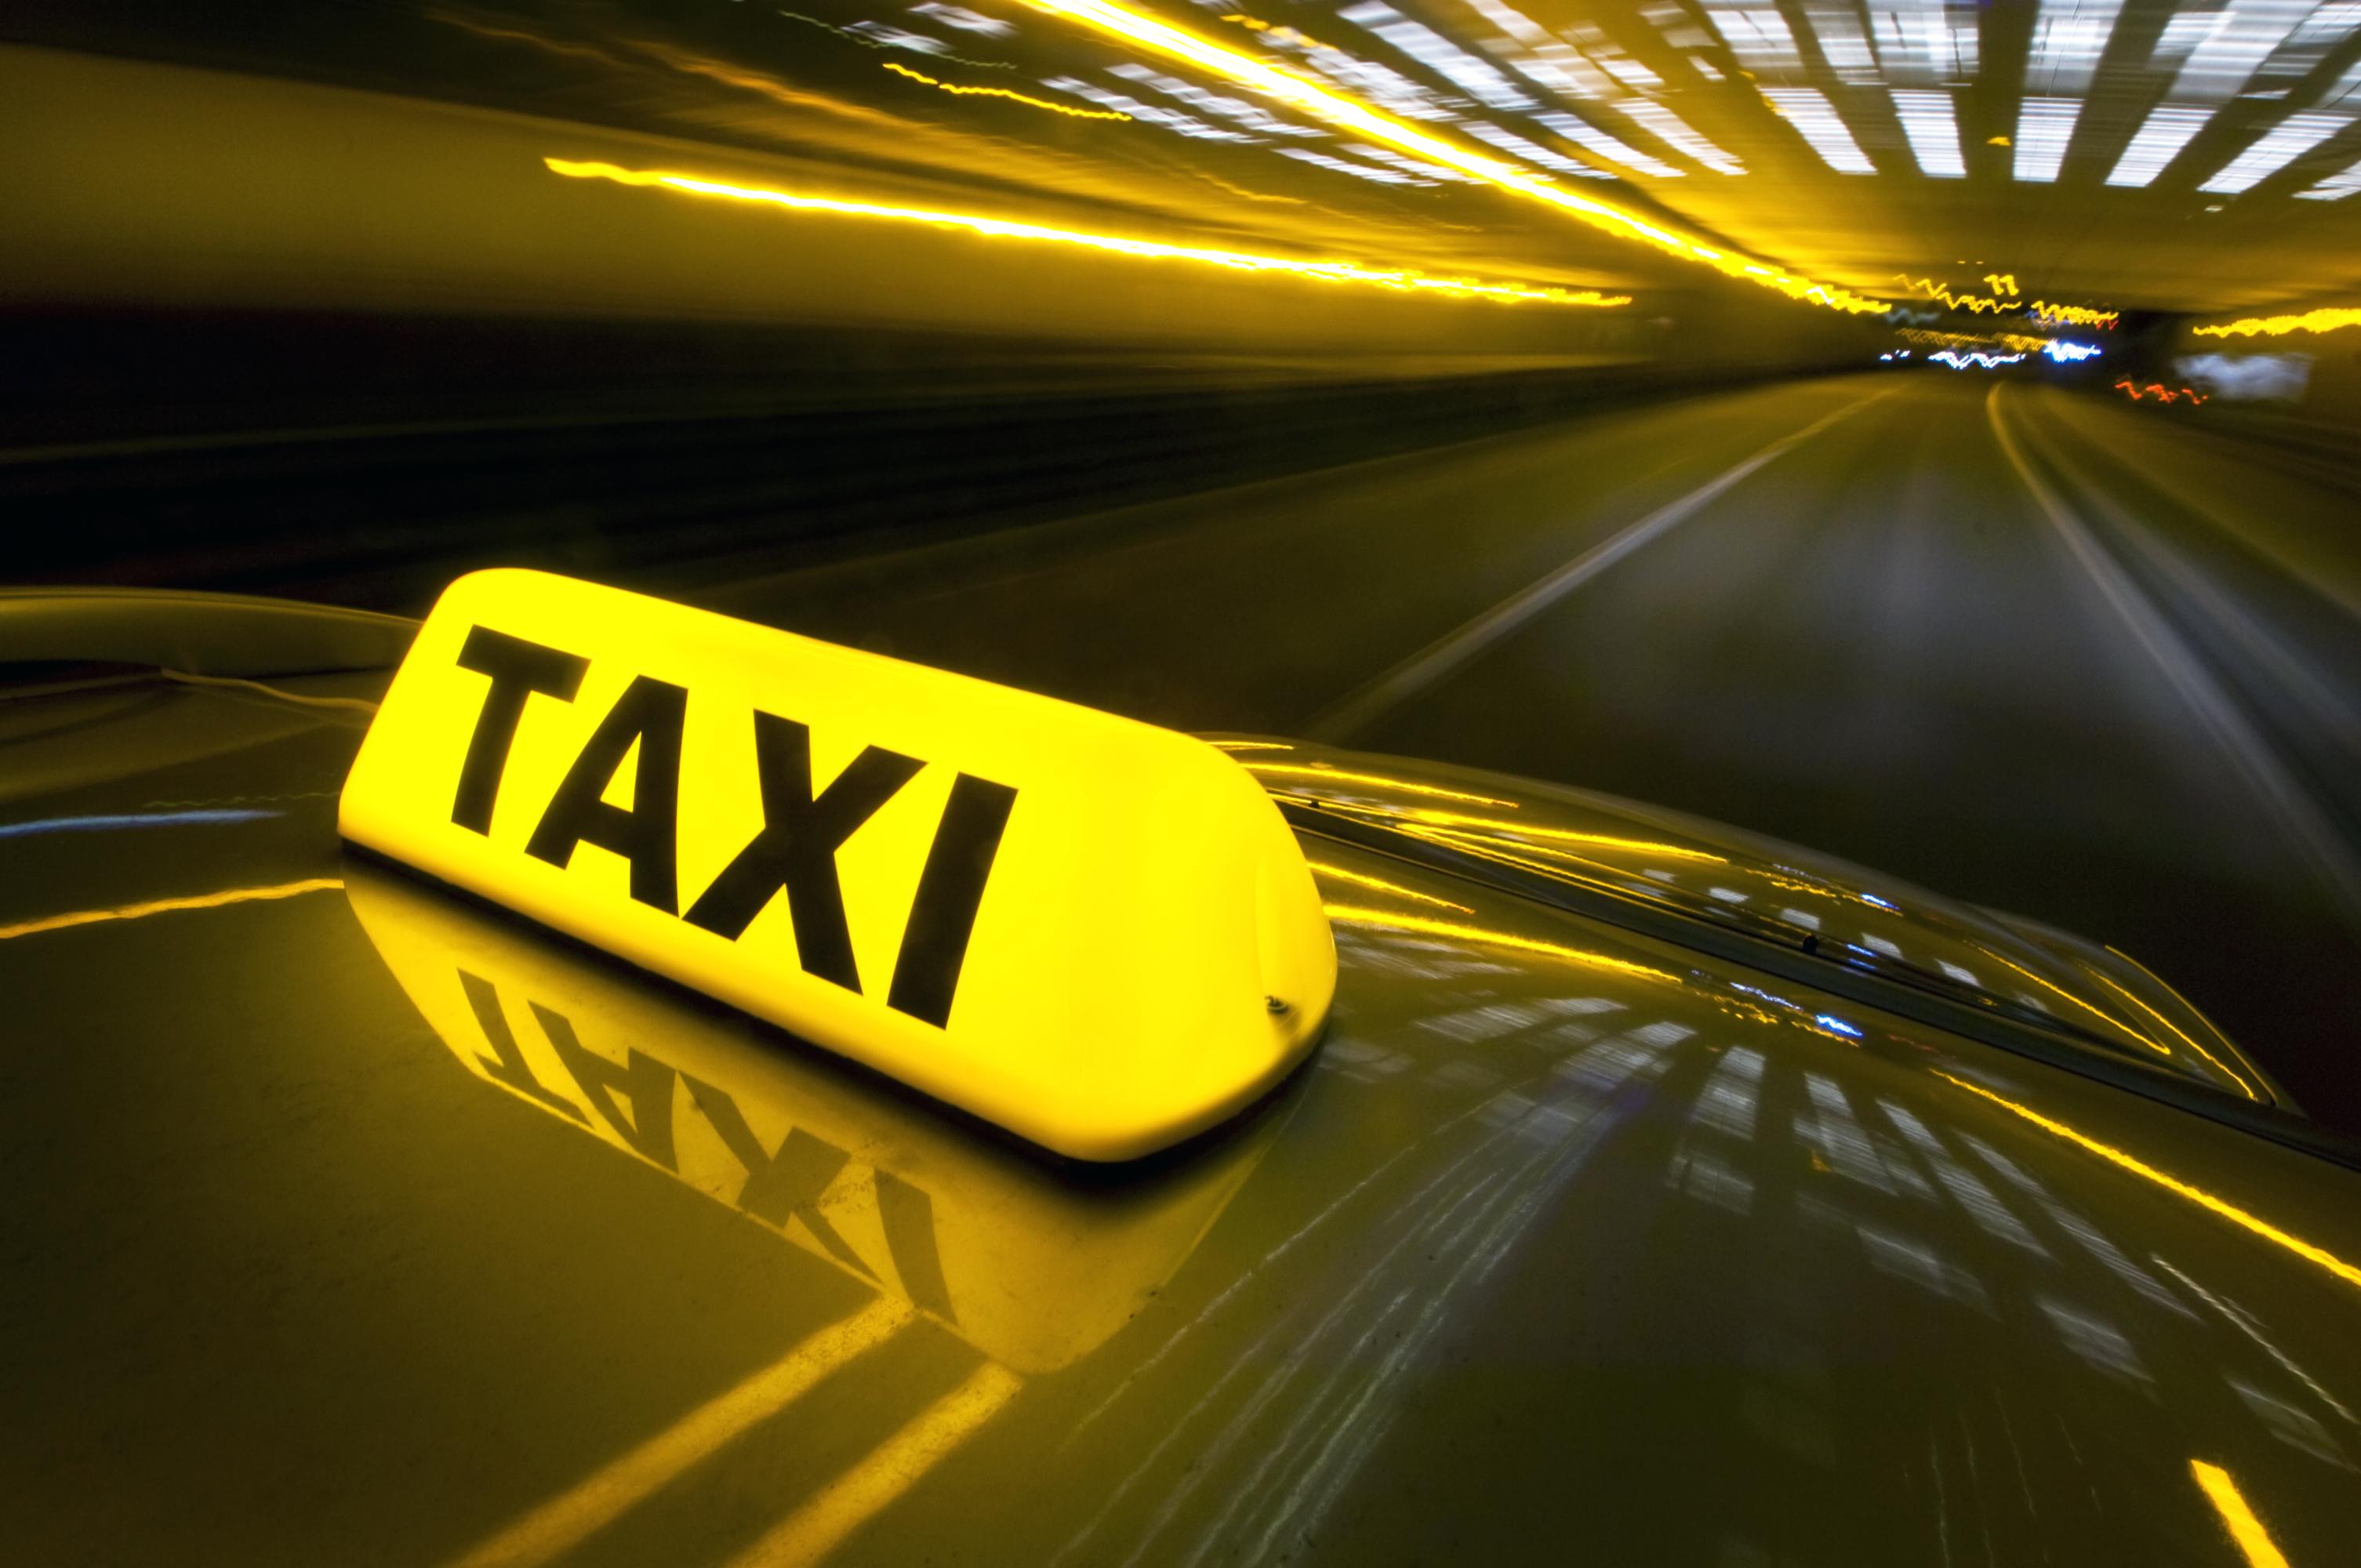 Taxi near me